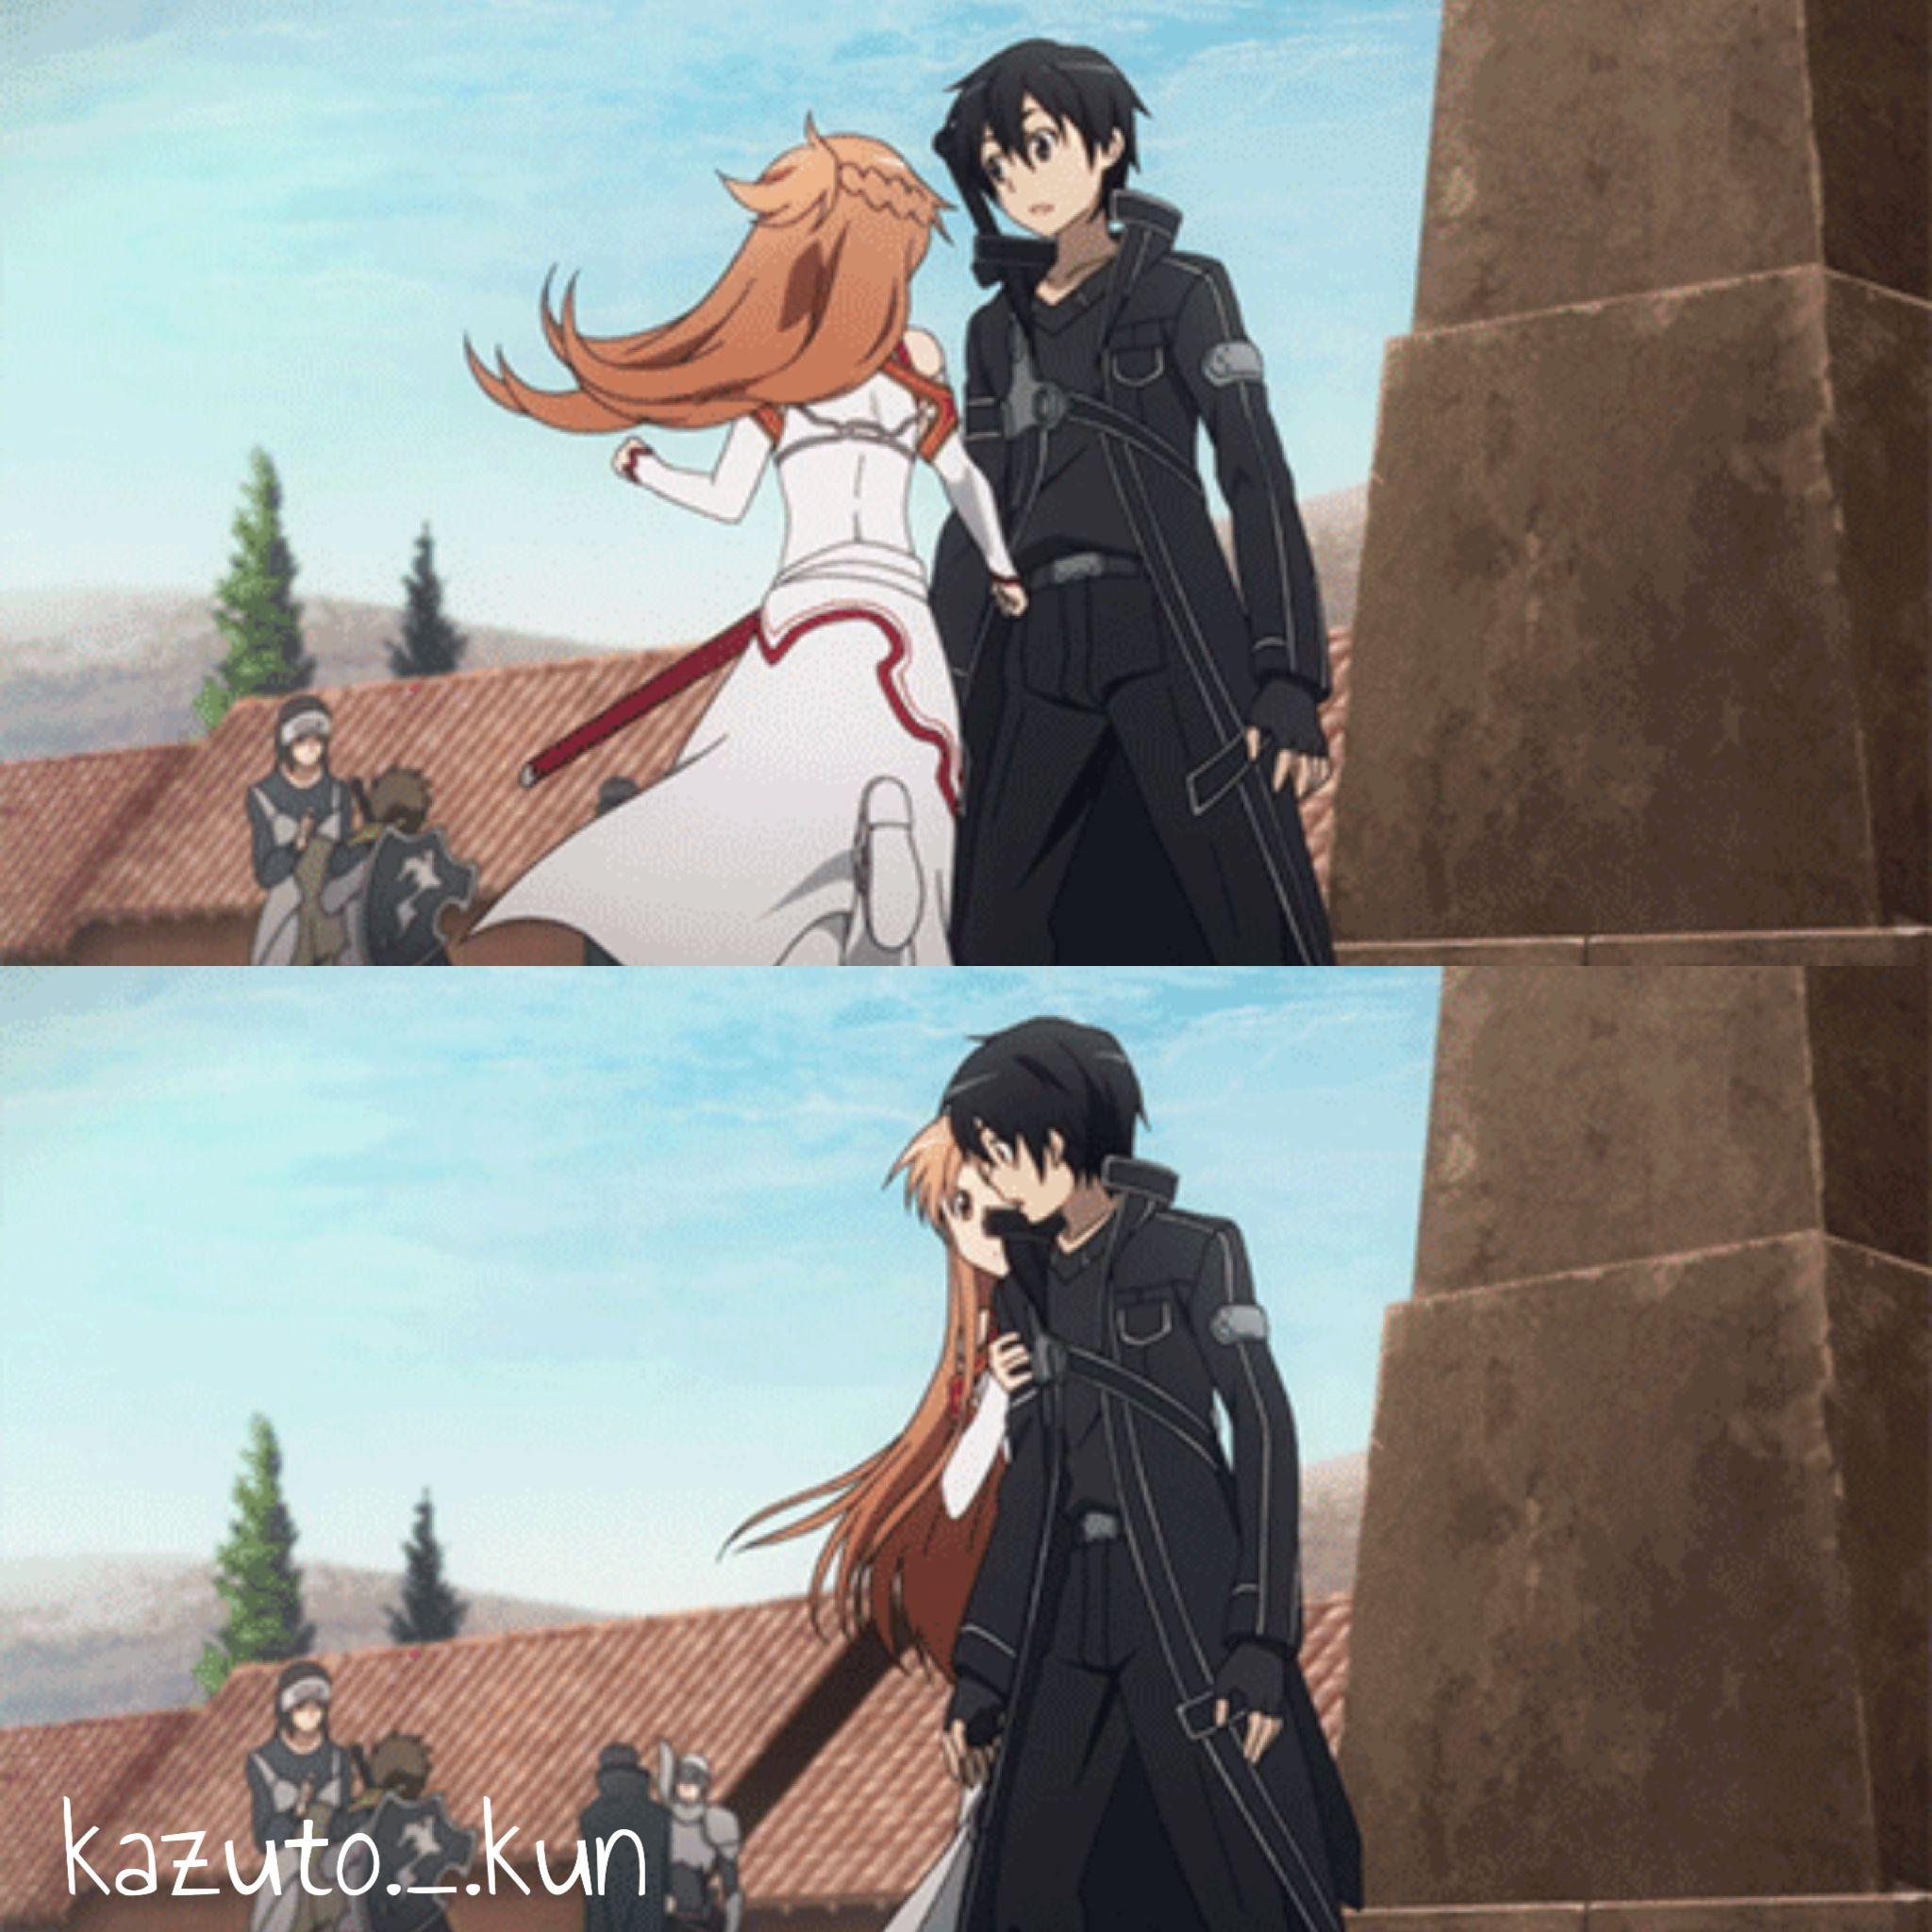 Asuna Plays Husband Shield With Images Sword Art Online Asuna